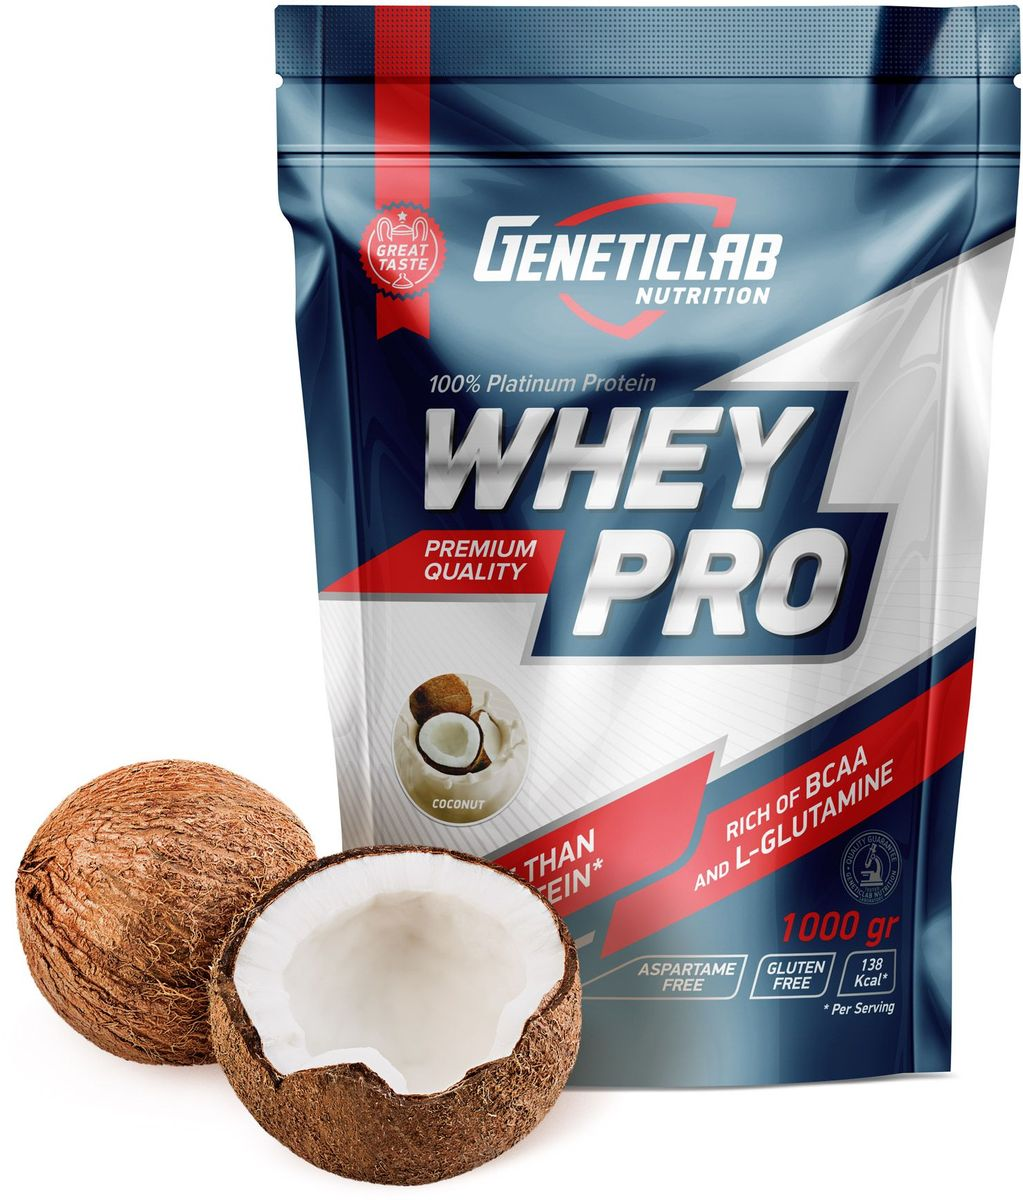 Протеин сывороточный Geneticlab Whey Pro, кокос, 1 кг сывороточный протеин bbb whey classic банан 70% белка и bcaa 1 кг